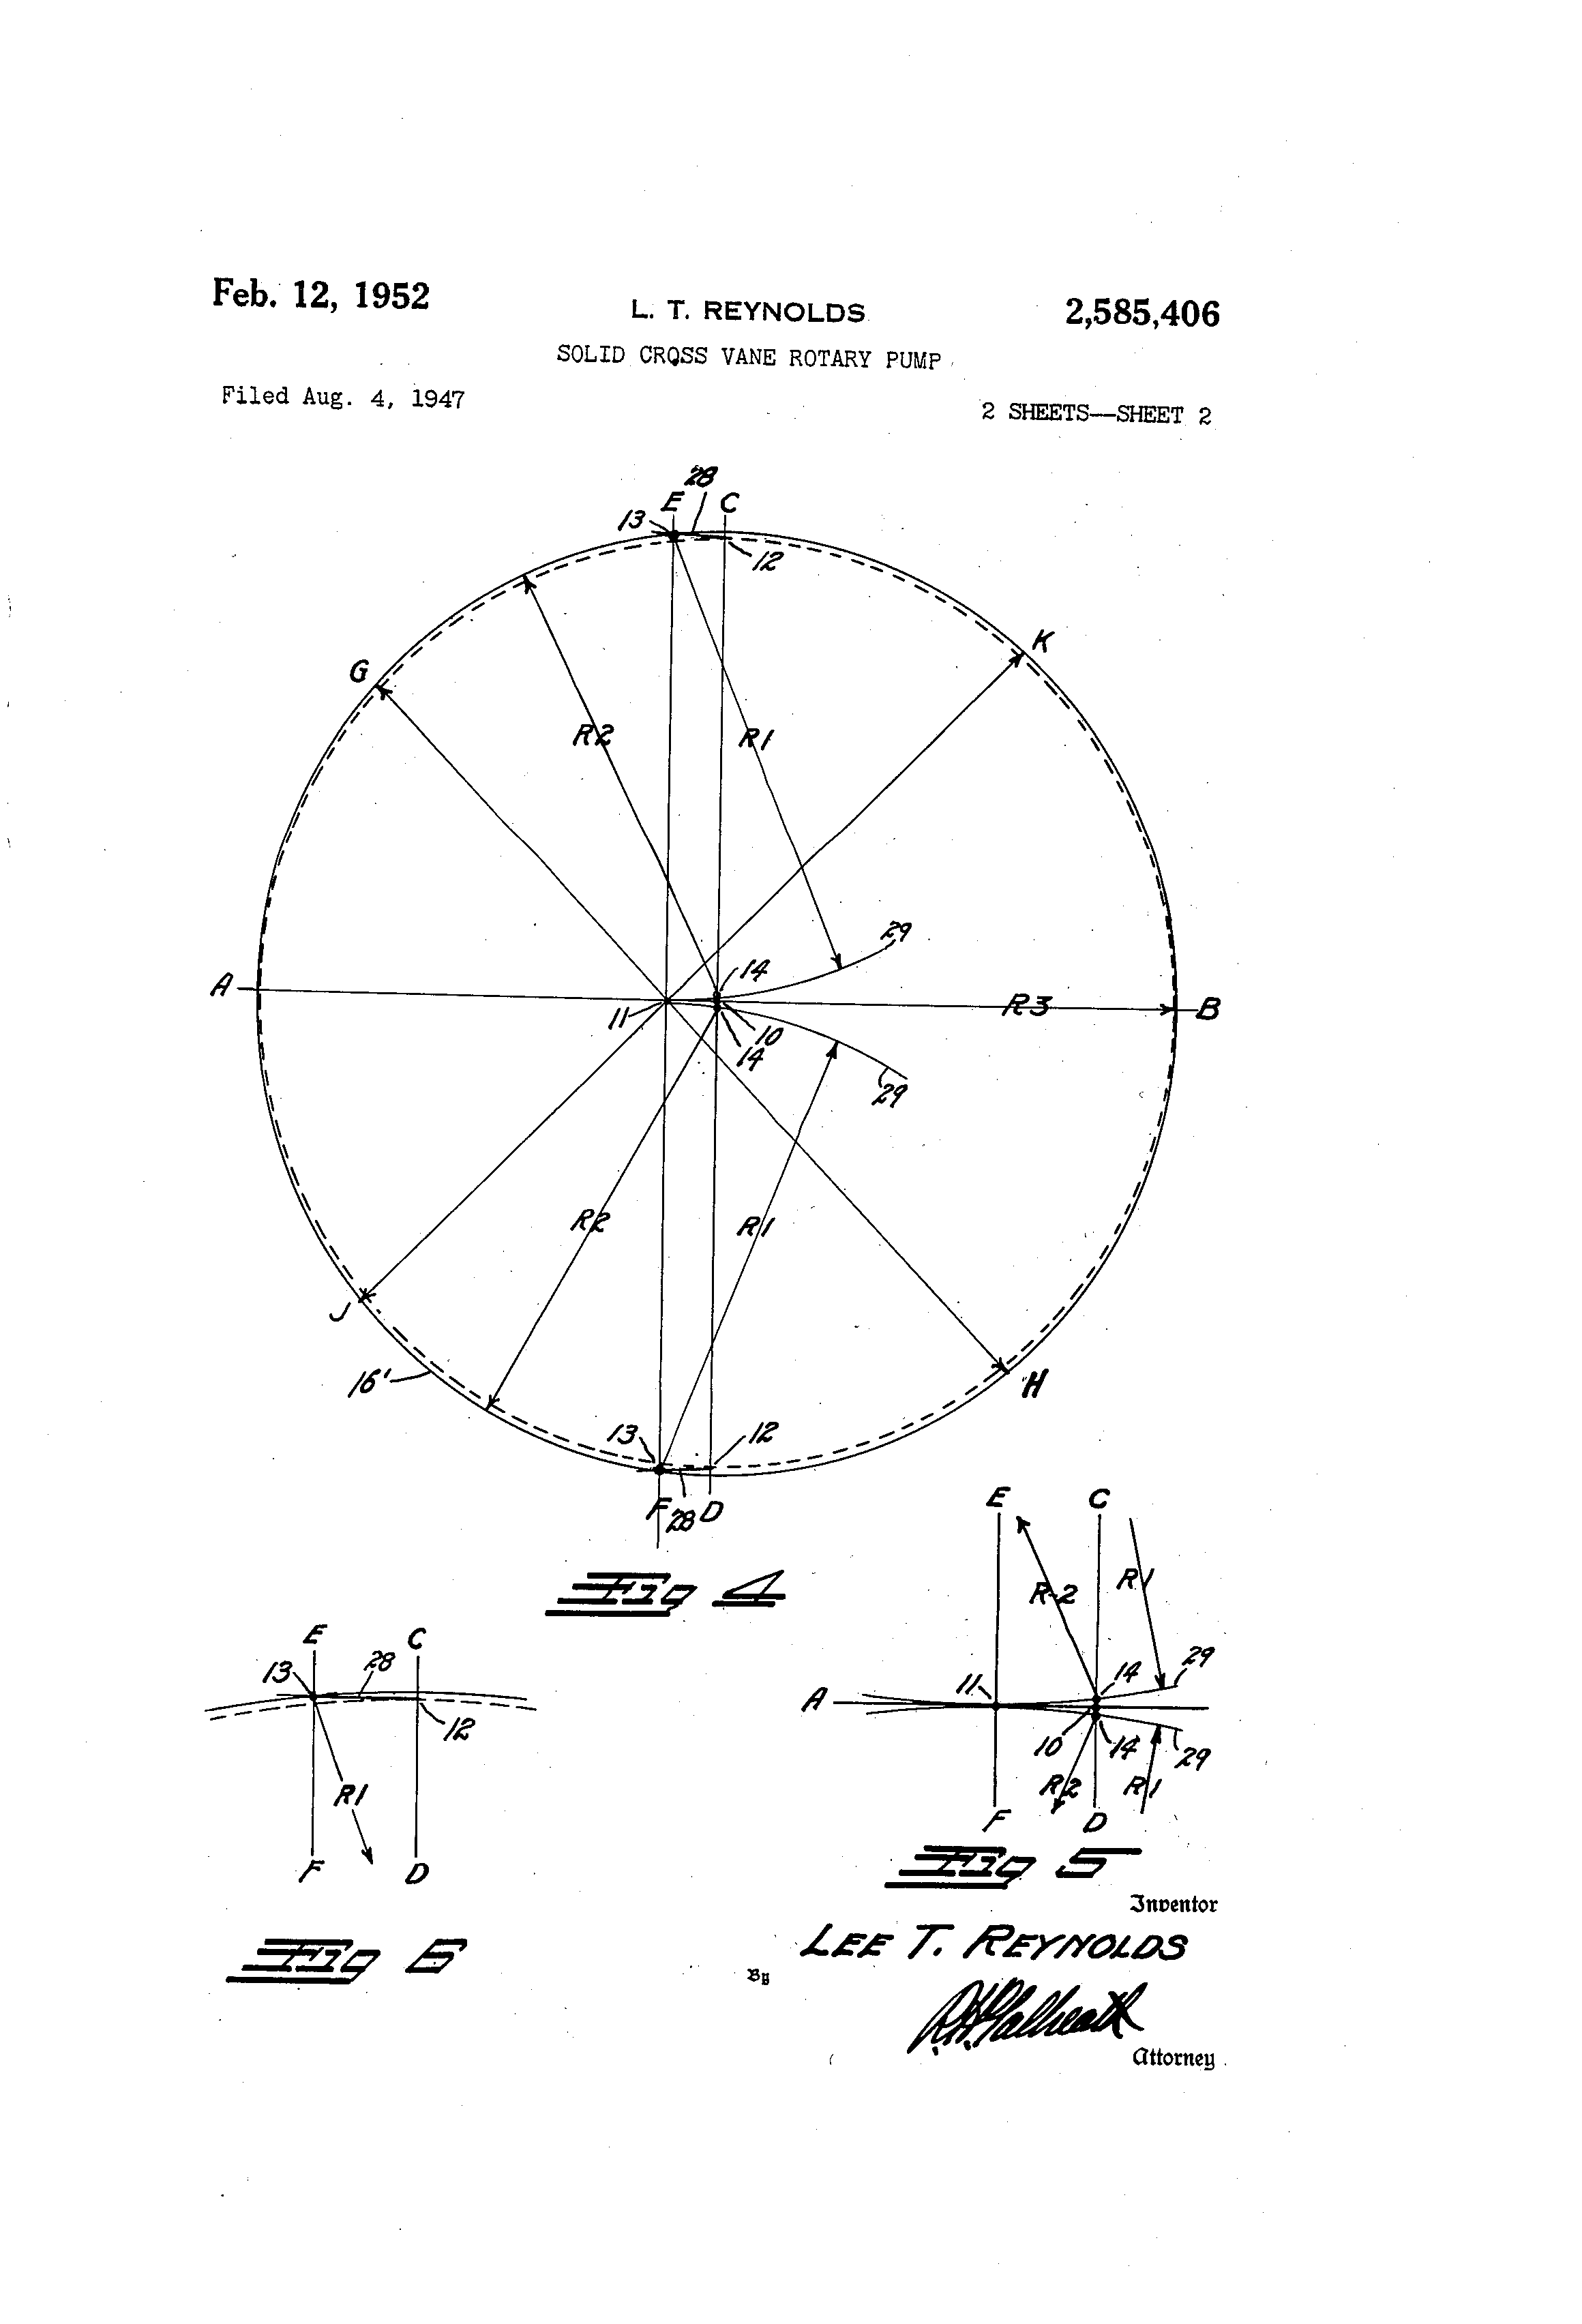 patent us2585406 - solid cross vane rotary pump